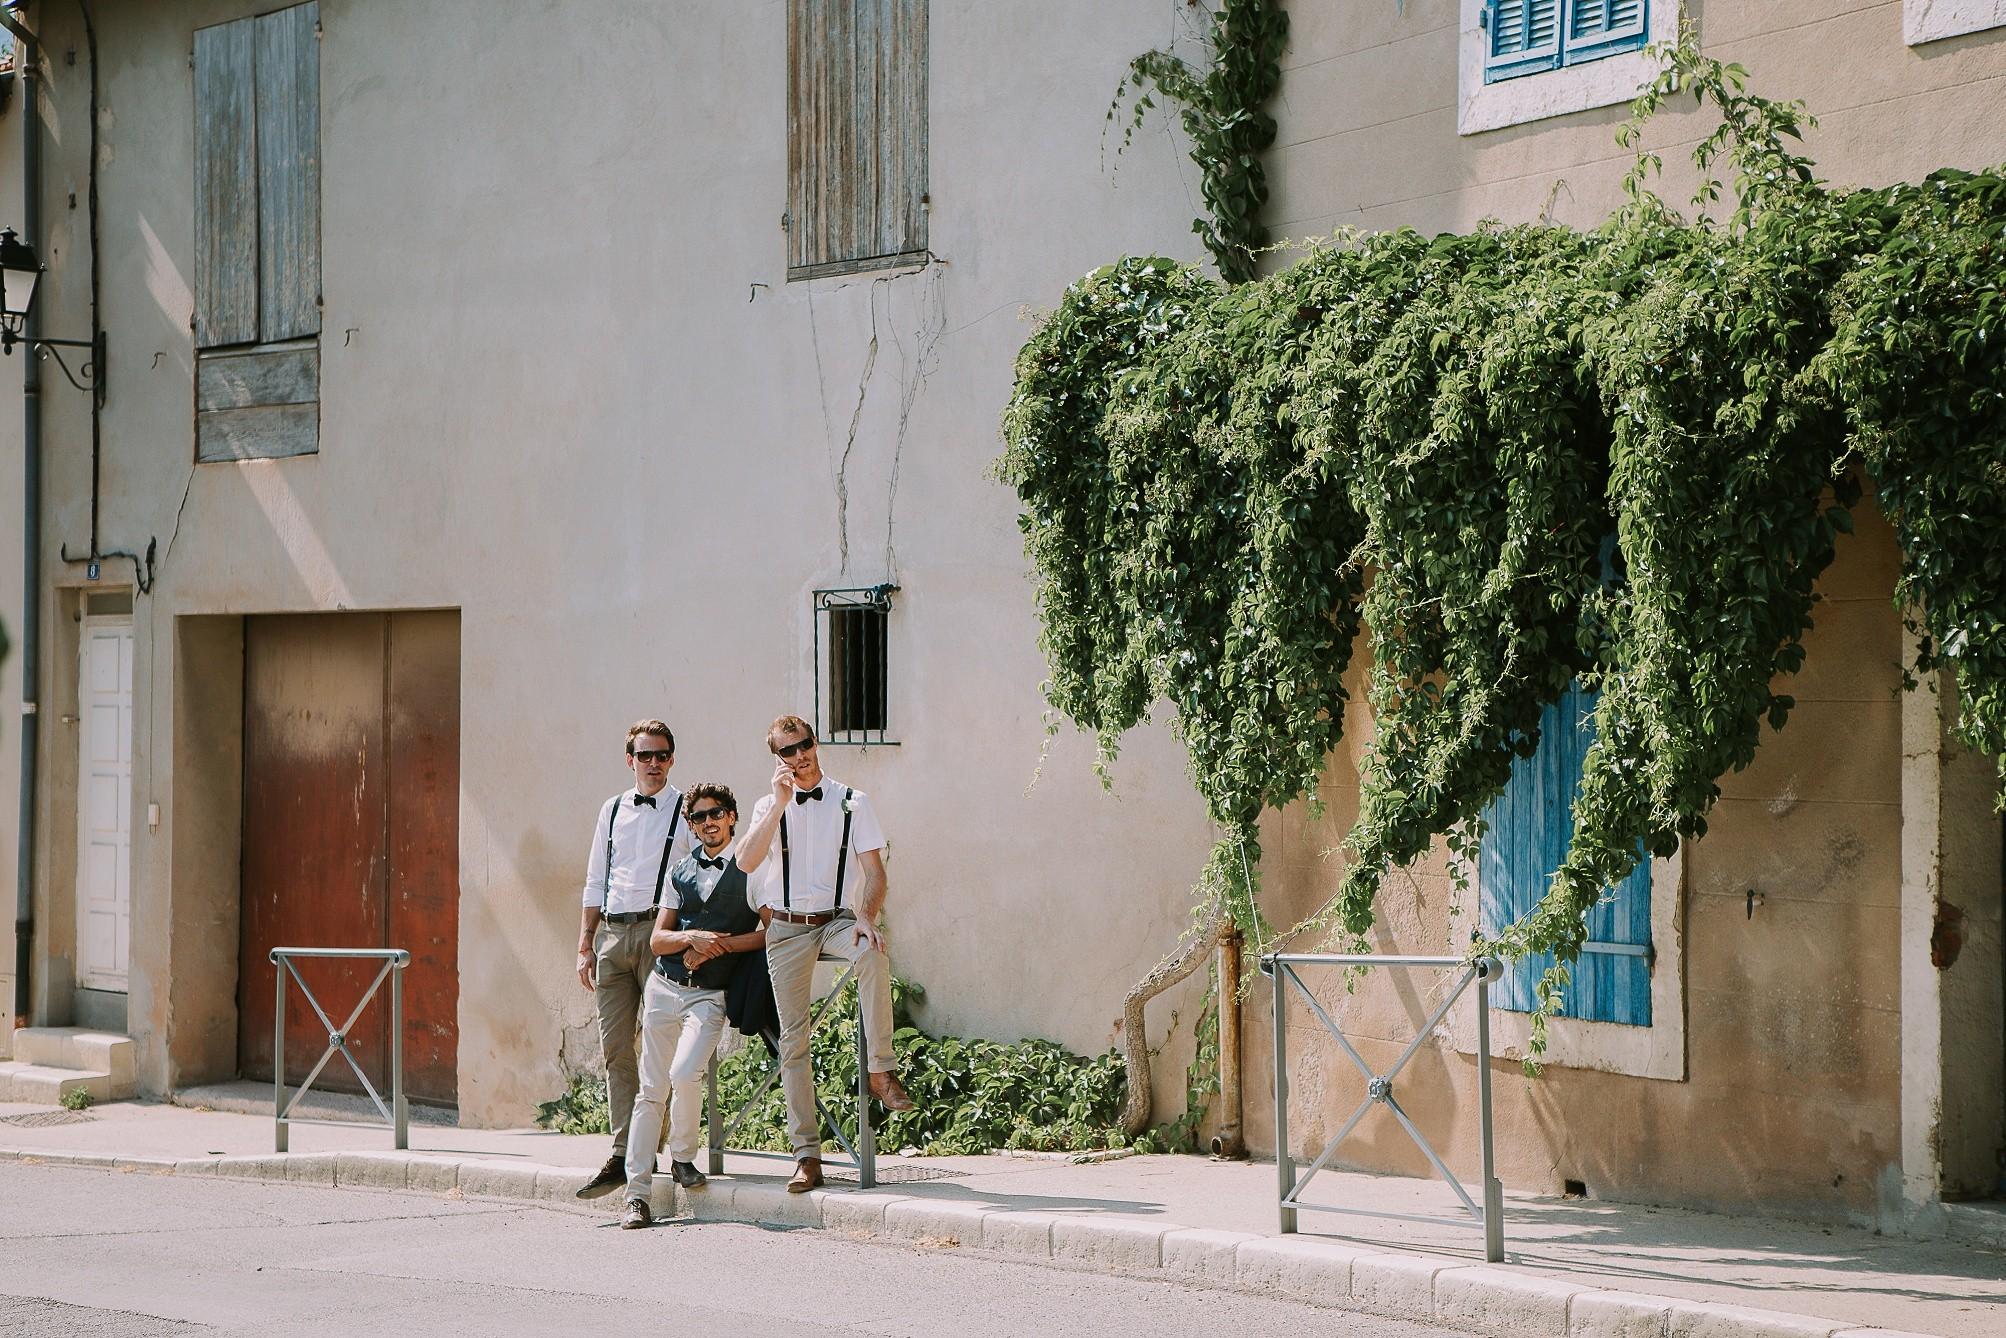 katerynaphotos-mariage-photographe-puyloubier-provence-aix-en-provence-sud-de-la-france_0380.jpg